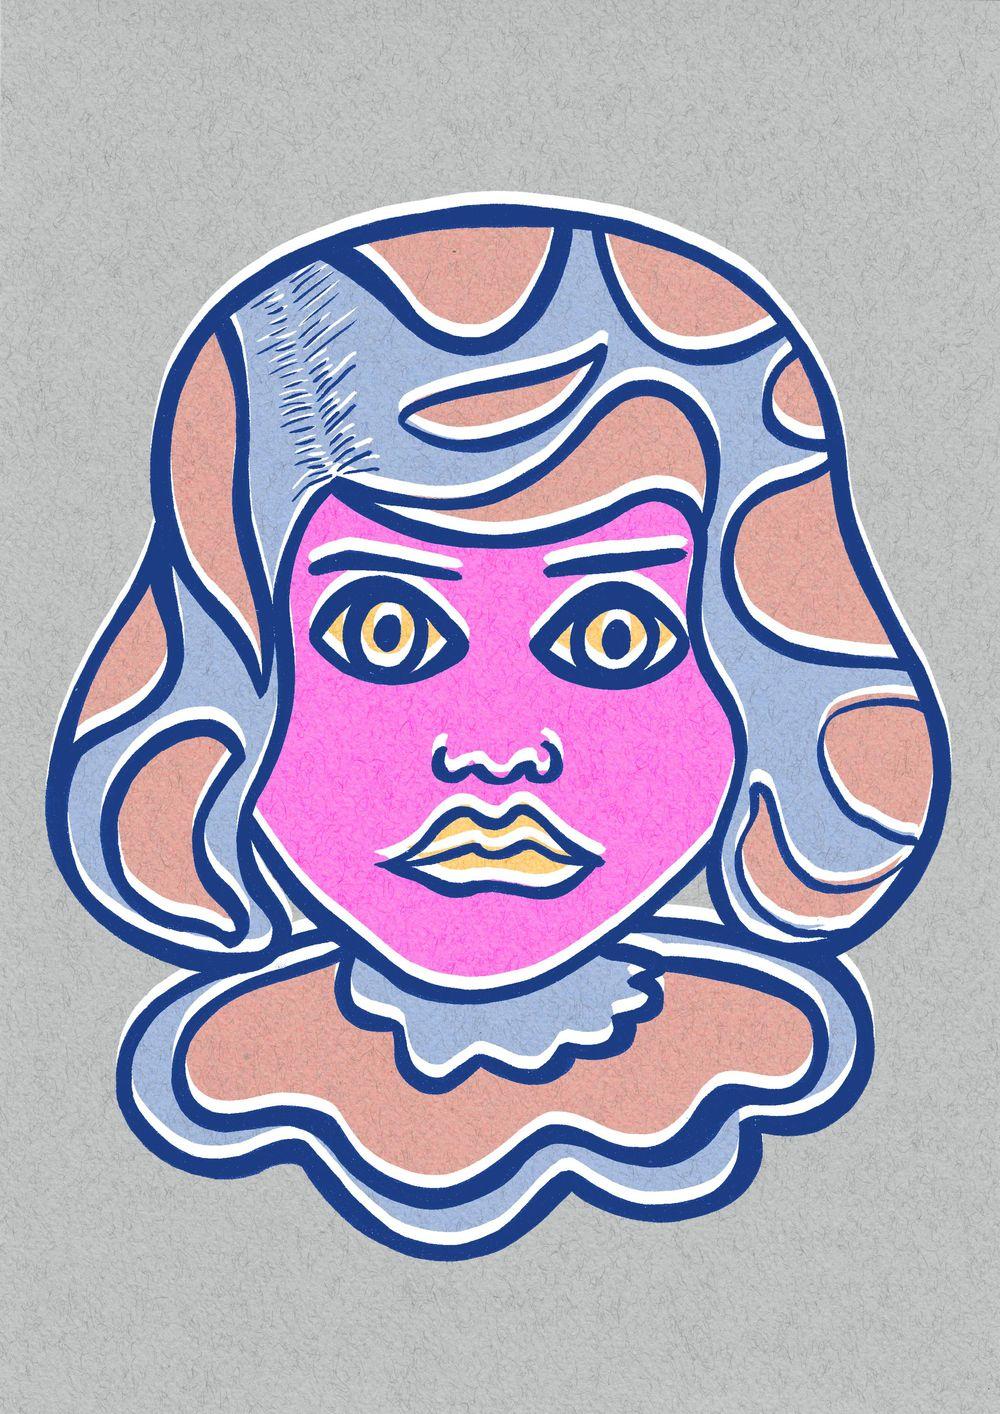 Pop art Girl - image 3 - student project